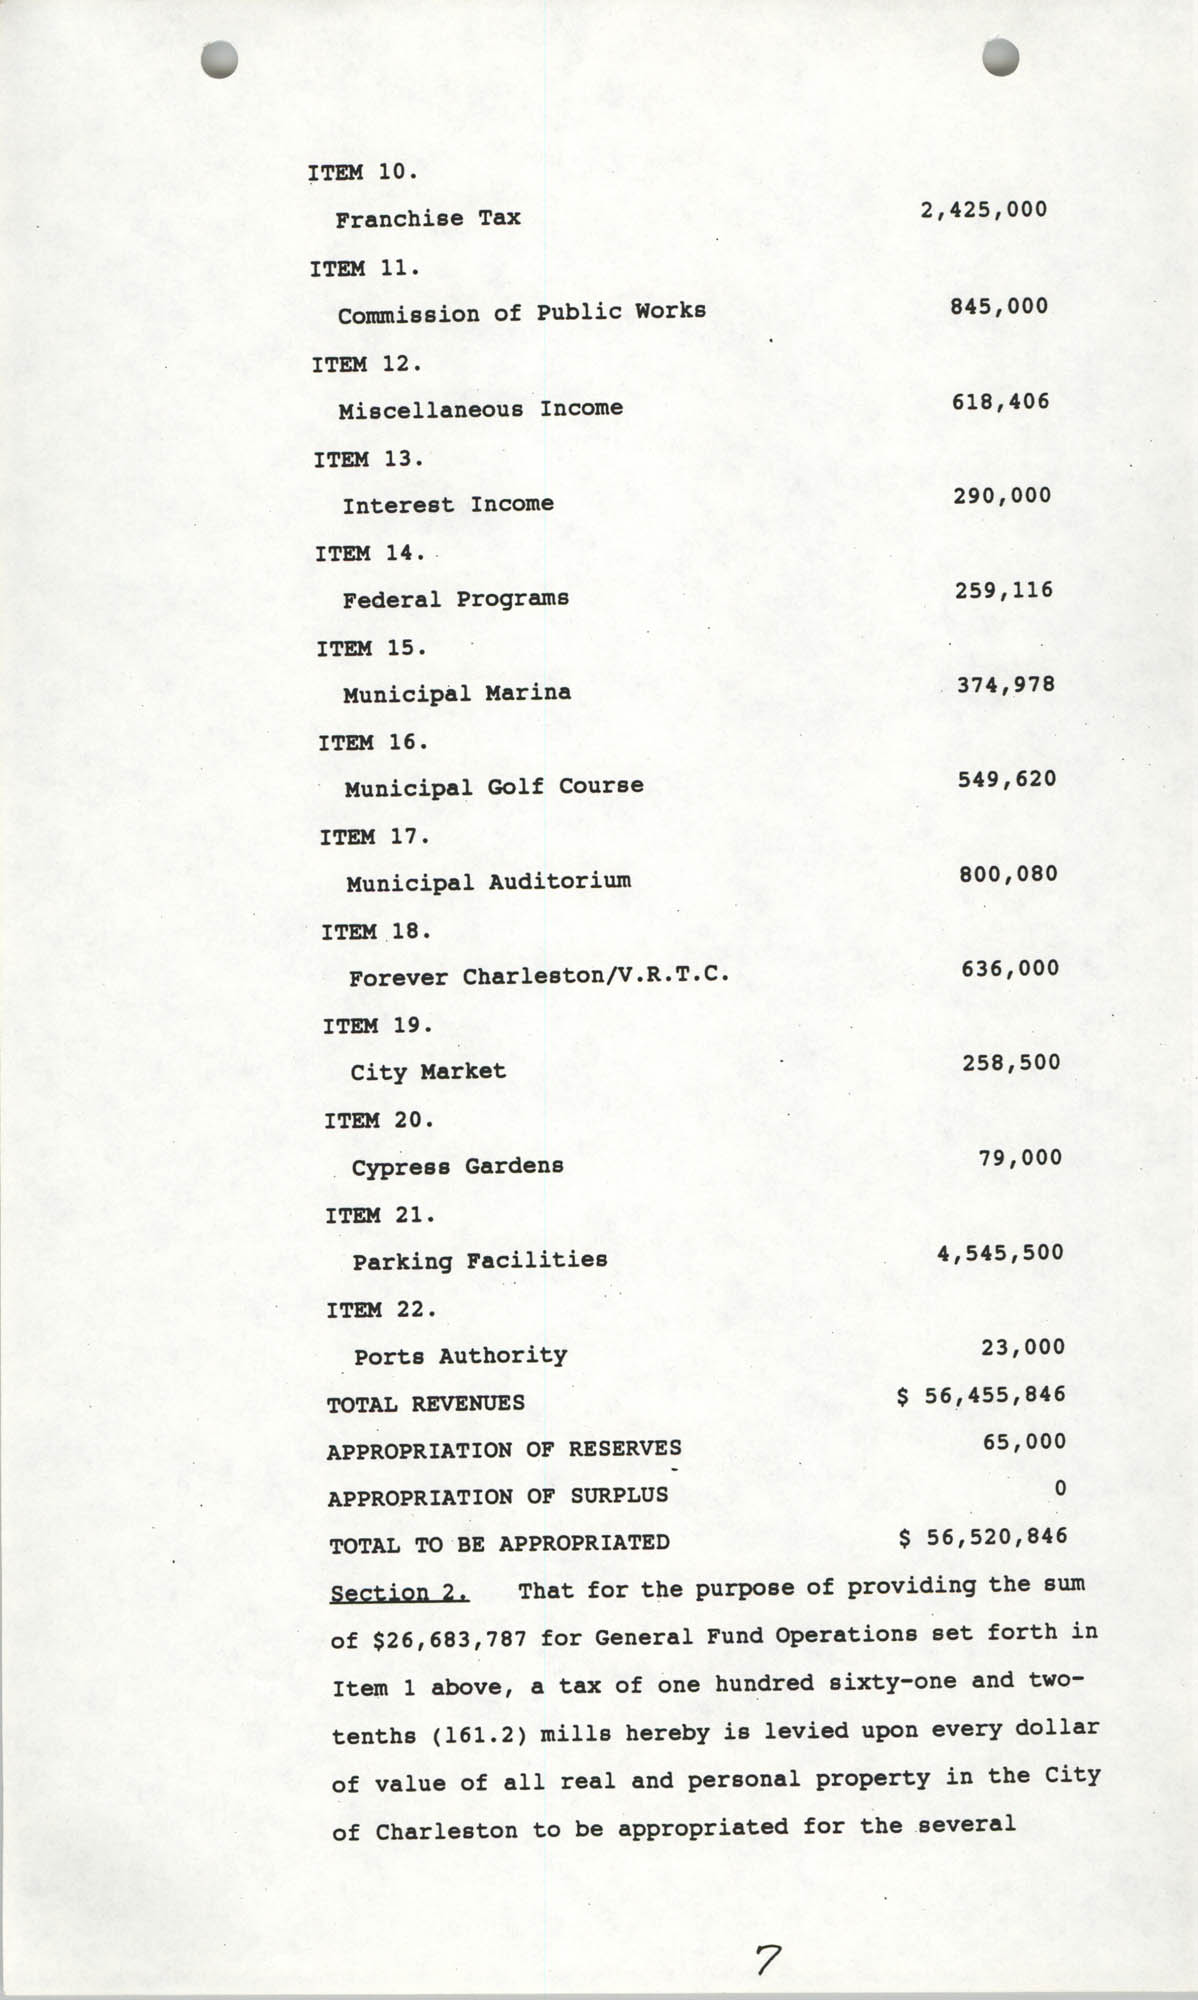 The City Council of Charleston, South Carolina, 1993 Budget, Page 7